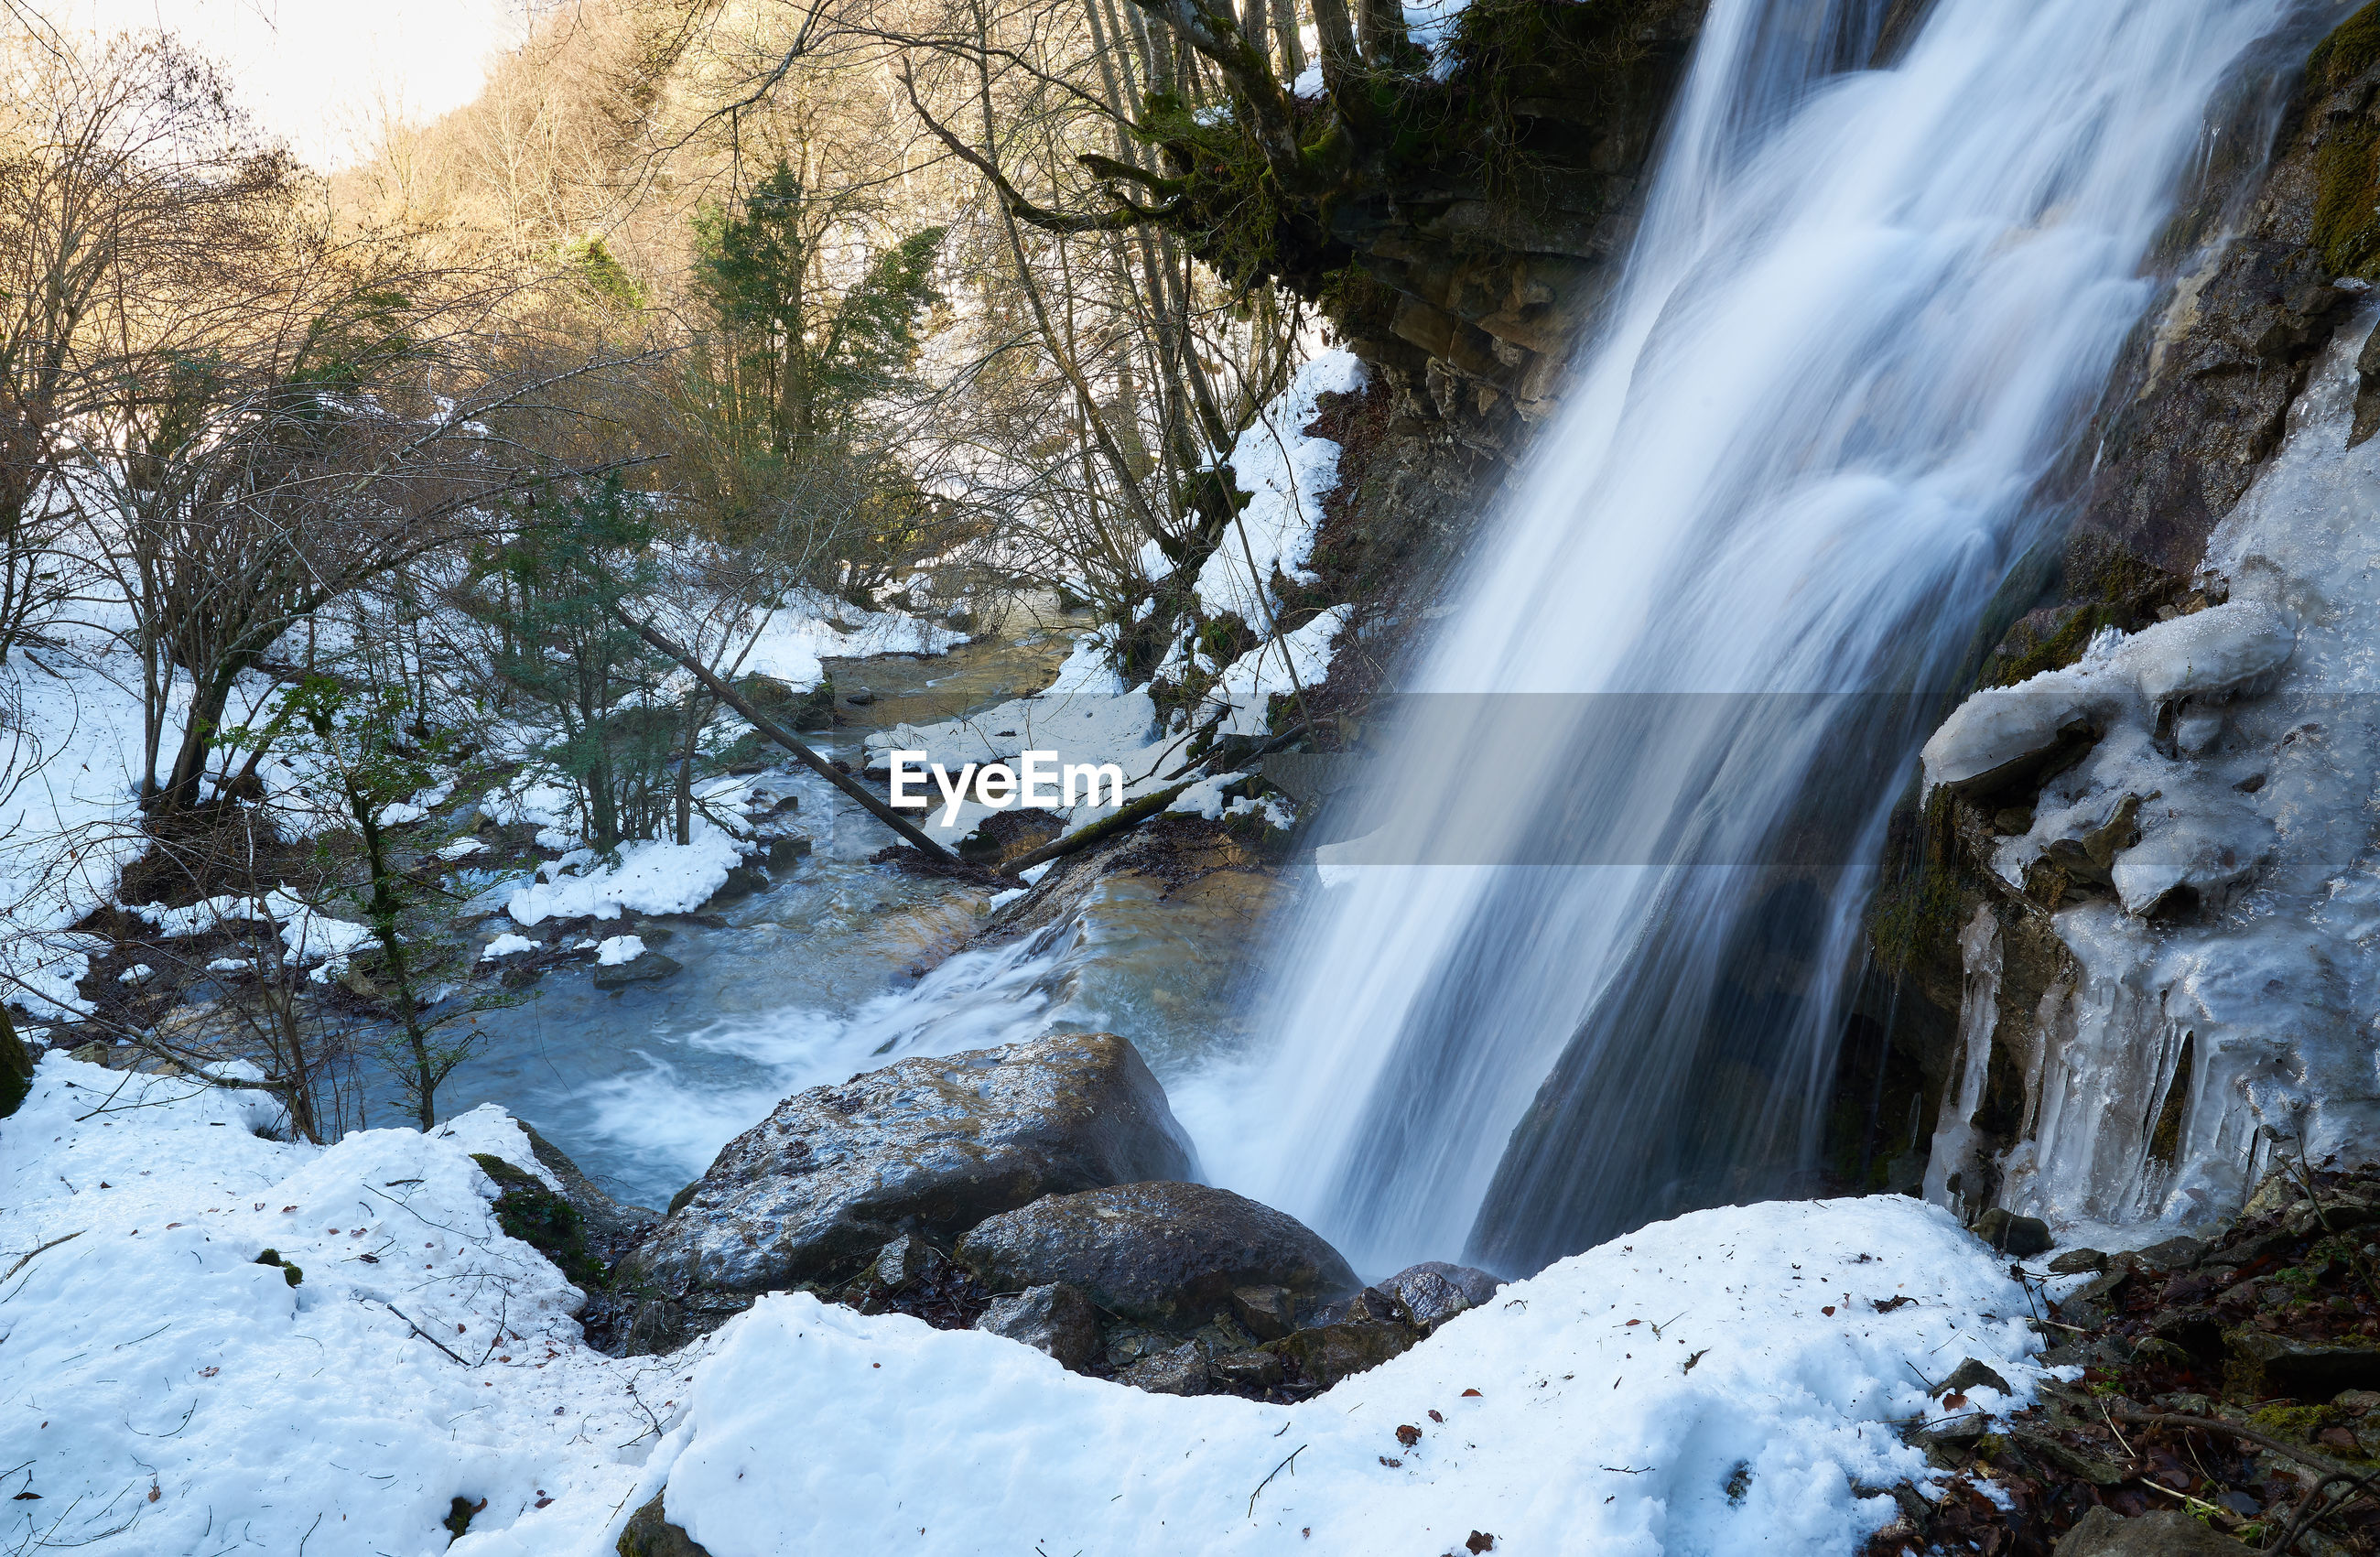 Snowy waterfall side view